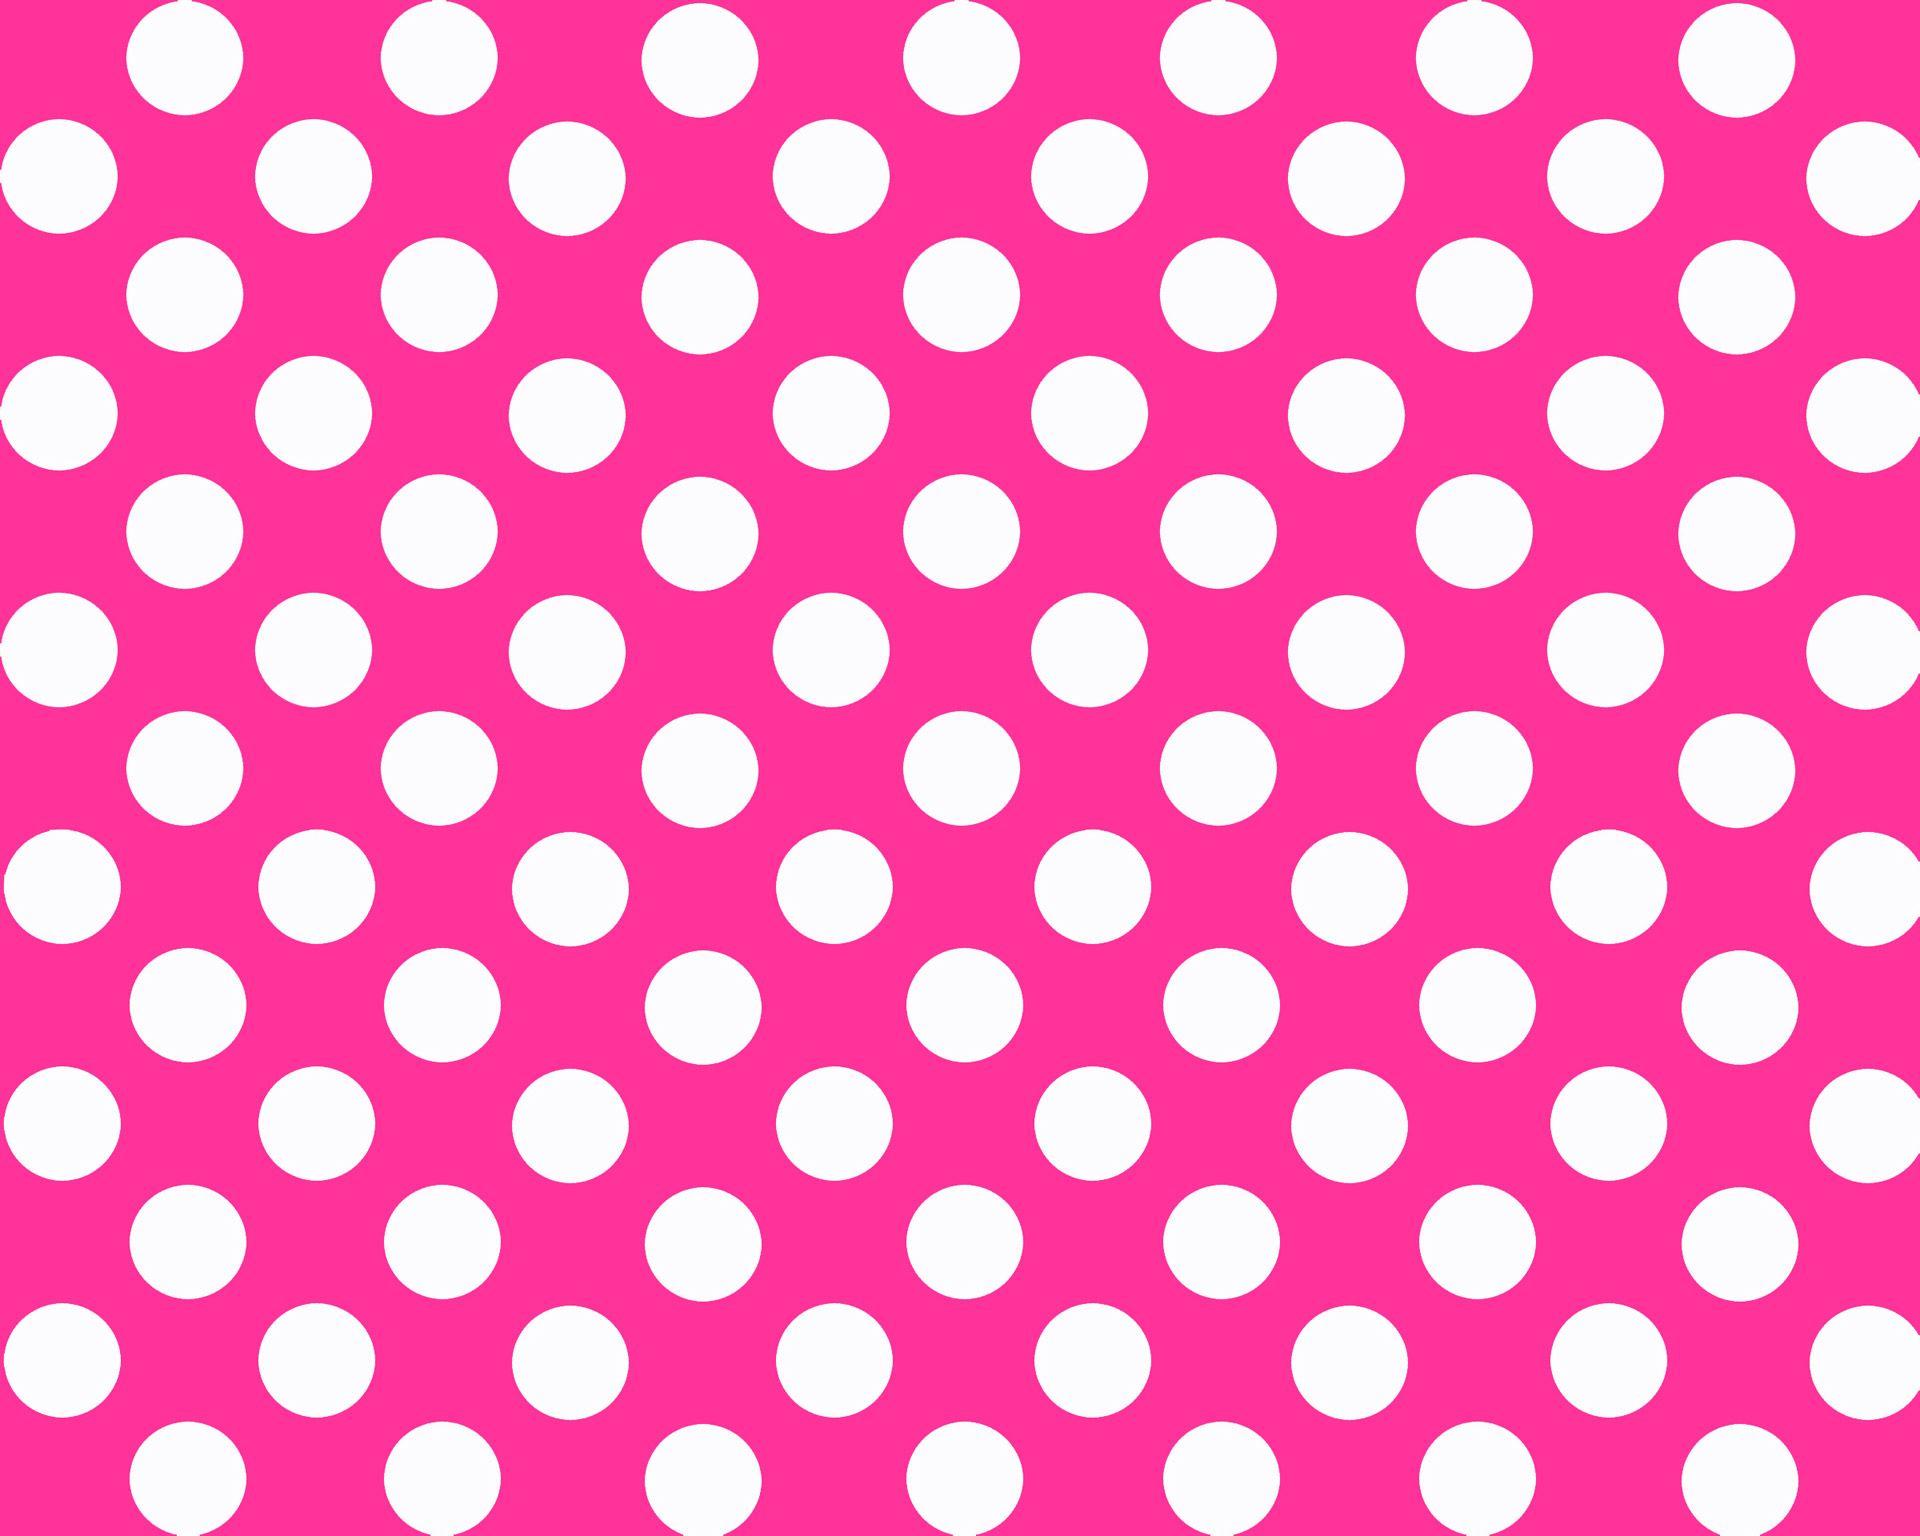 Pink Dots Hd Wallpapers Wallpaperzall Pink Polka Dots Background Polka Dot Background Polka Dots Wallpaper